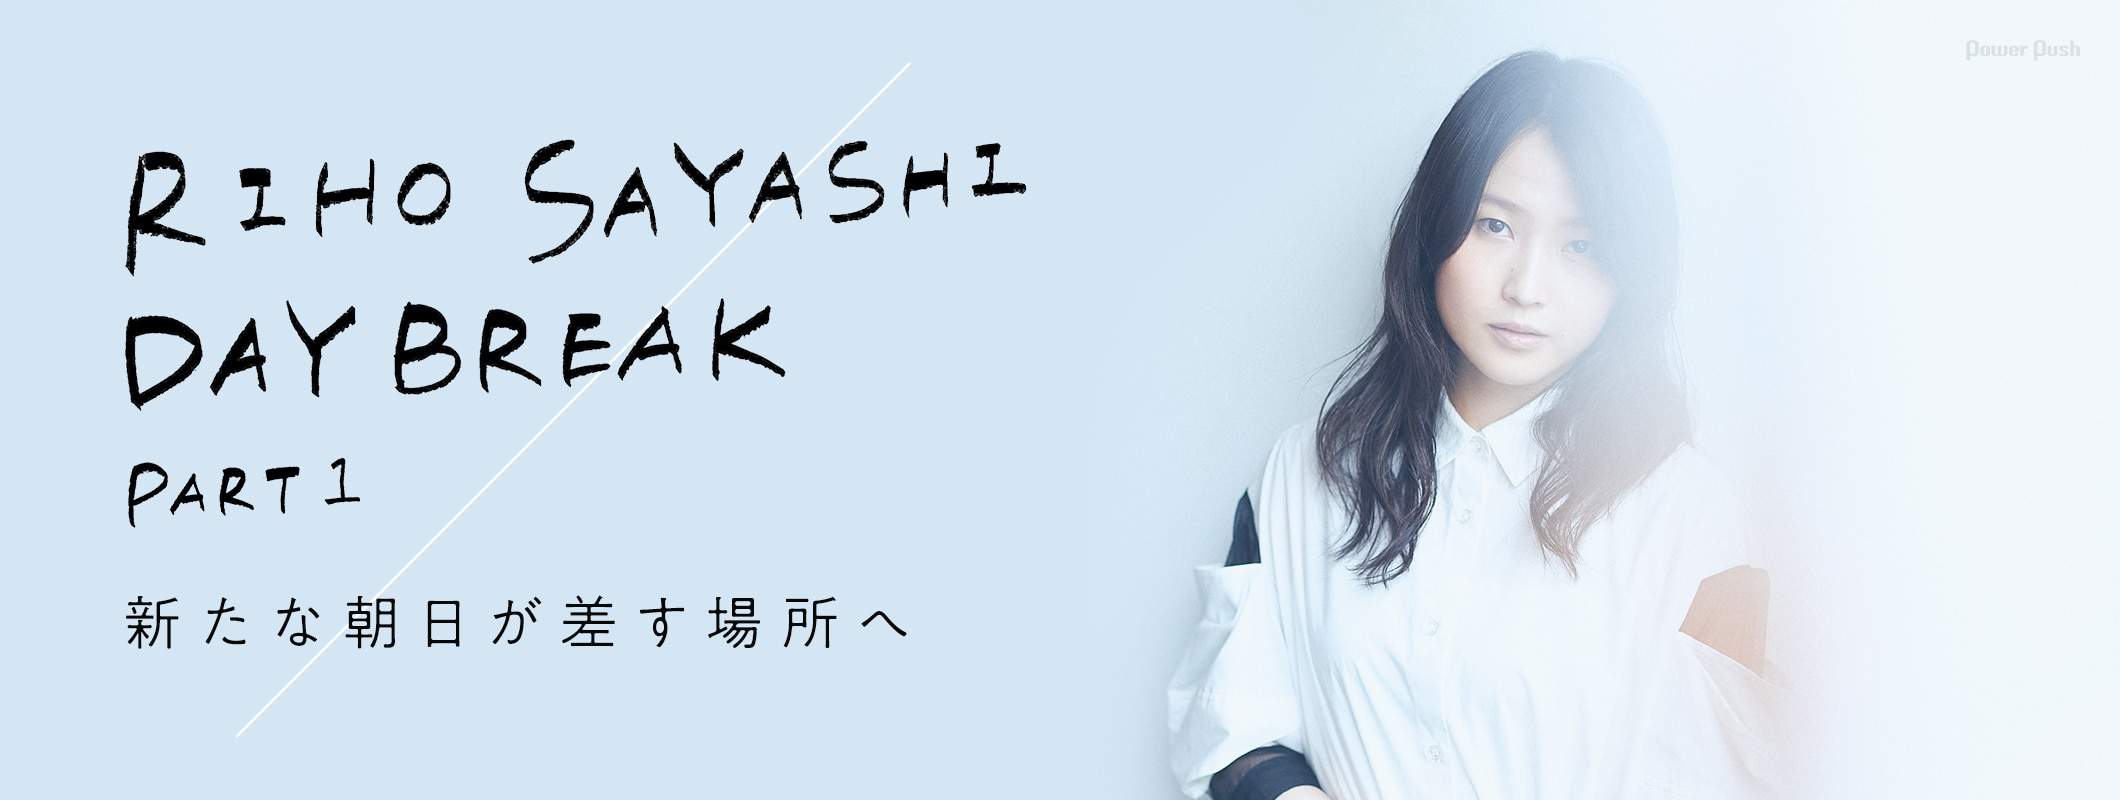 SAYASHI RIHO「DAYBREAK」PART1  新たな朝日が差す場所へ